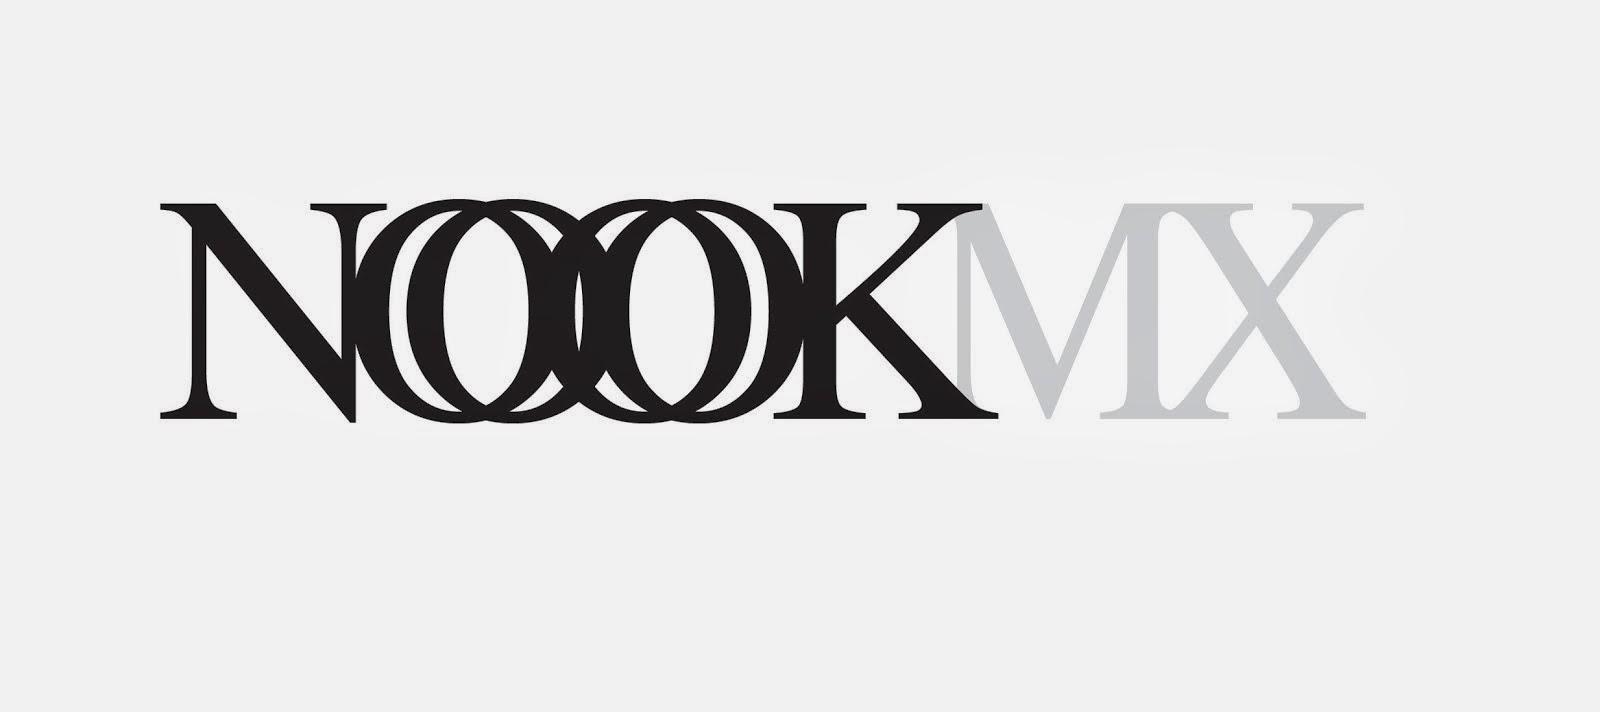 NOOKMX